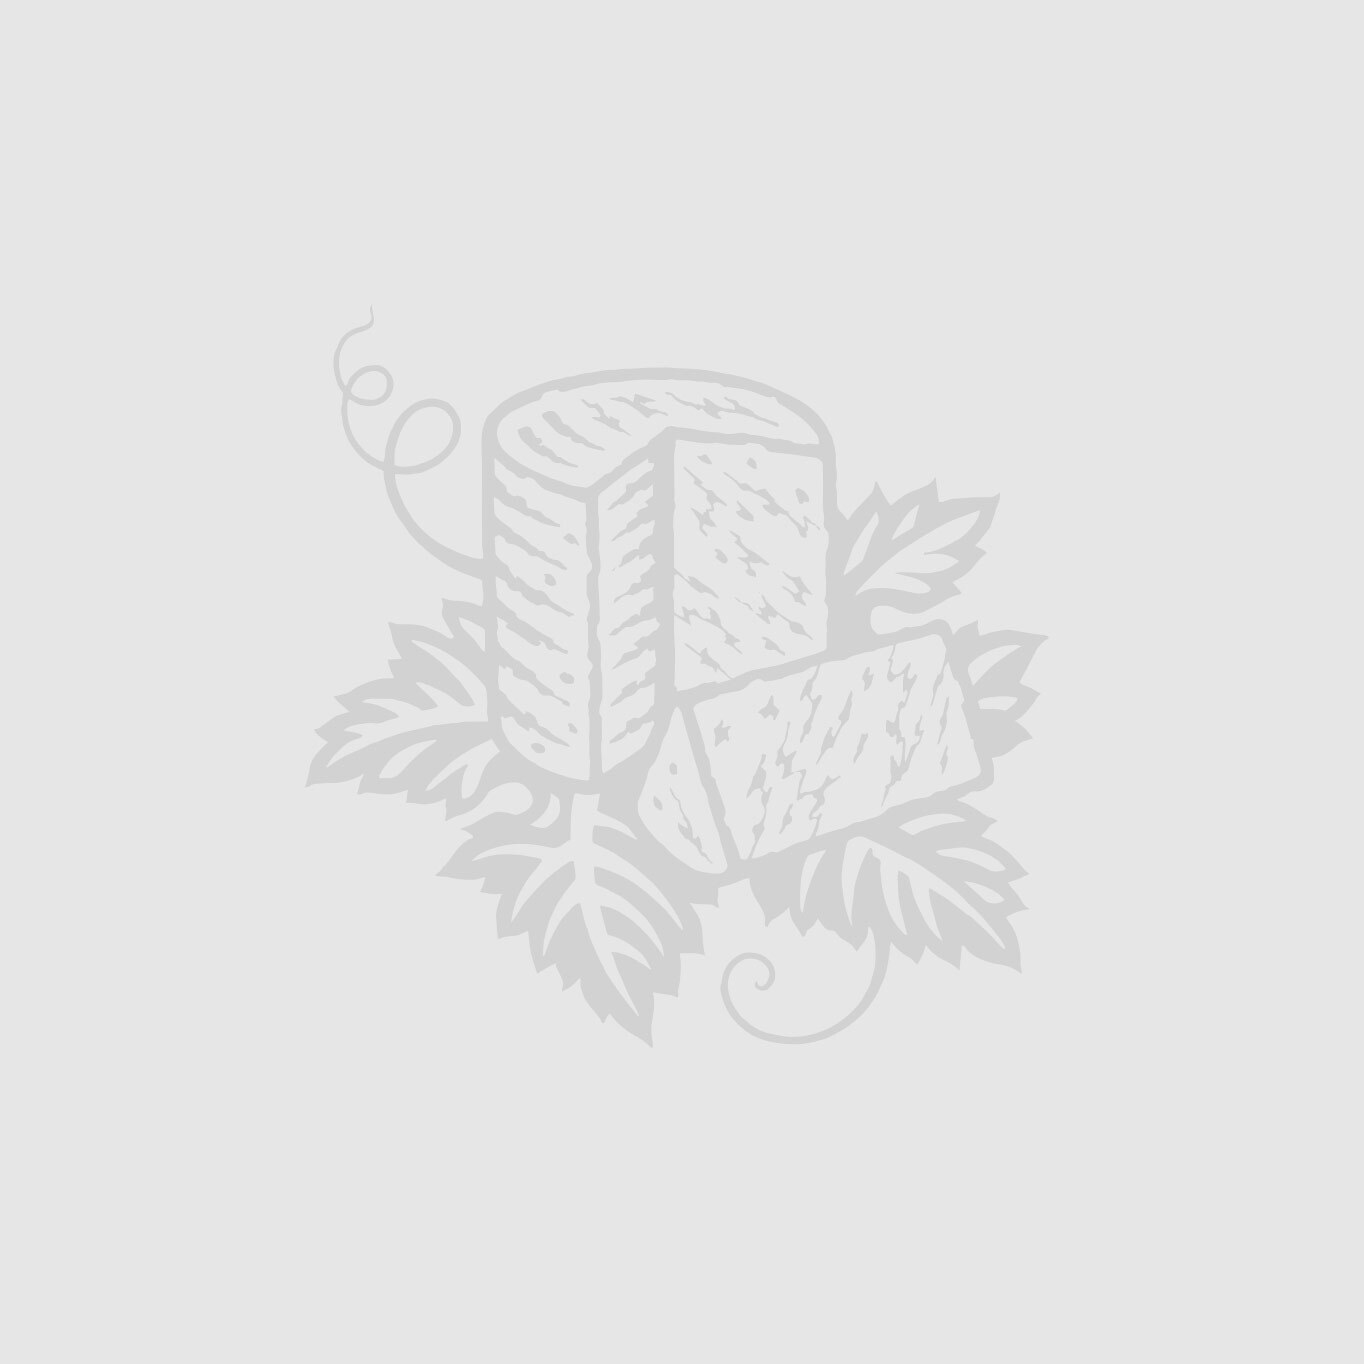 5 x Grate Britain Stilton Crackers Pouches For 'Grab & Go'